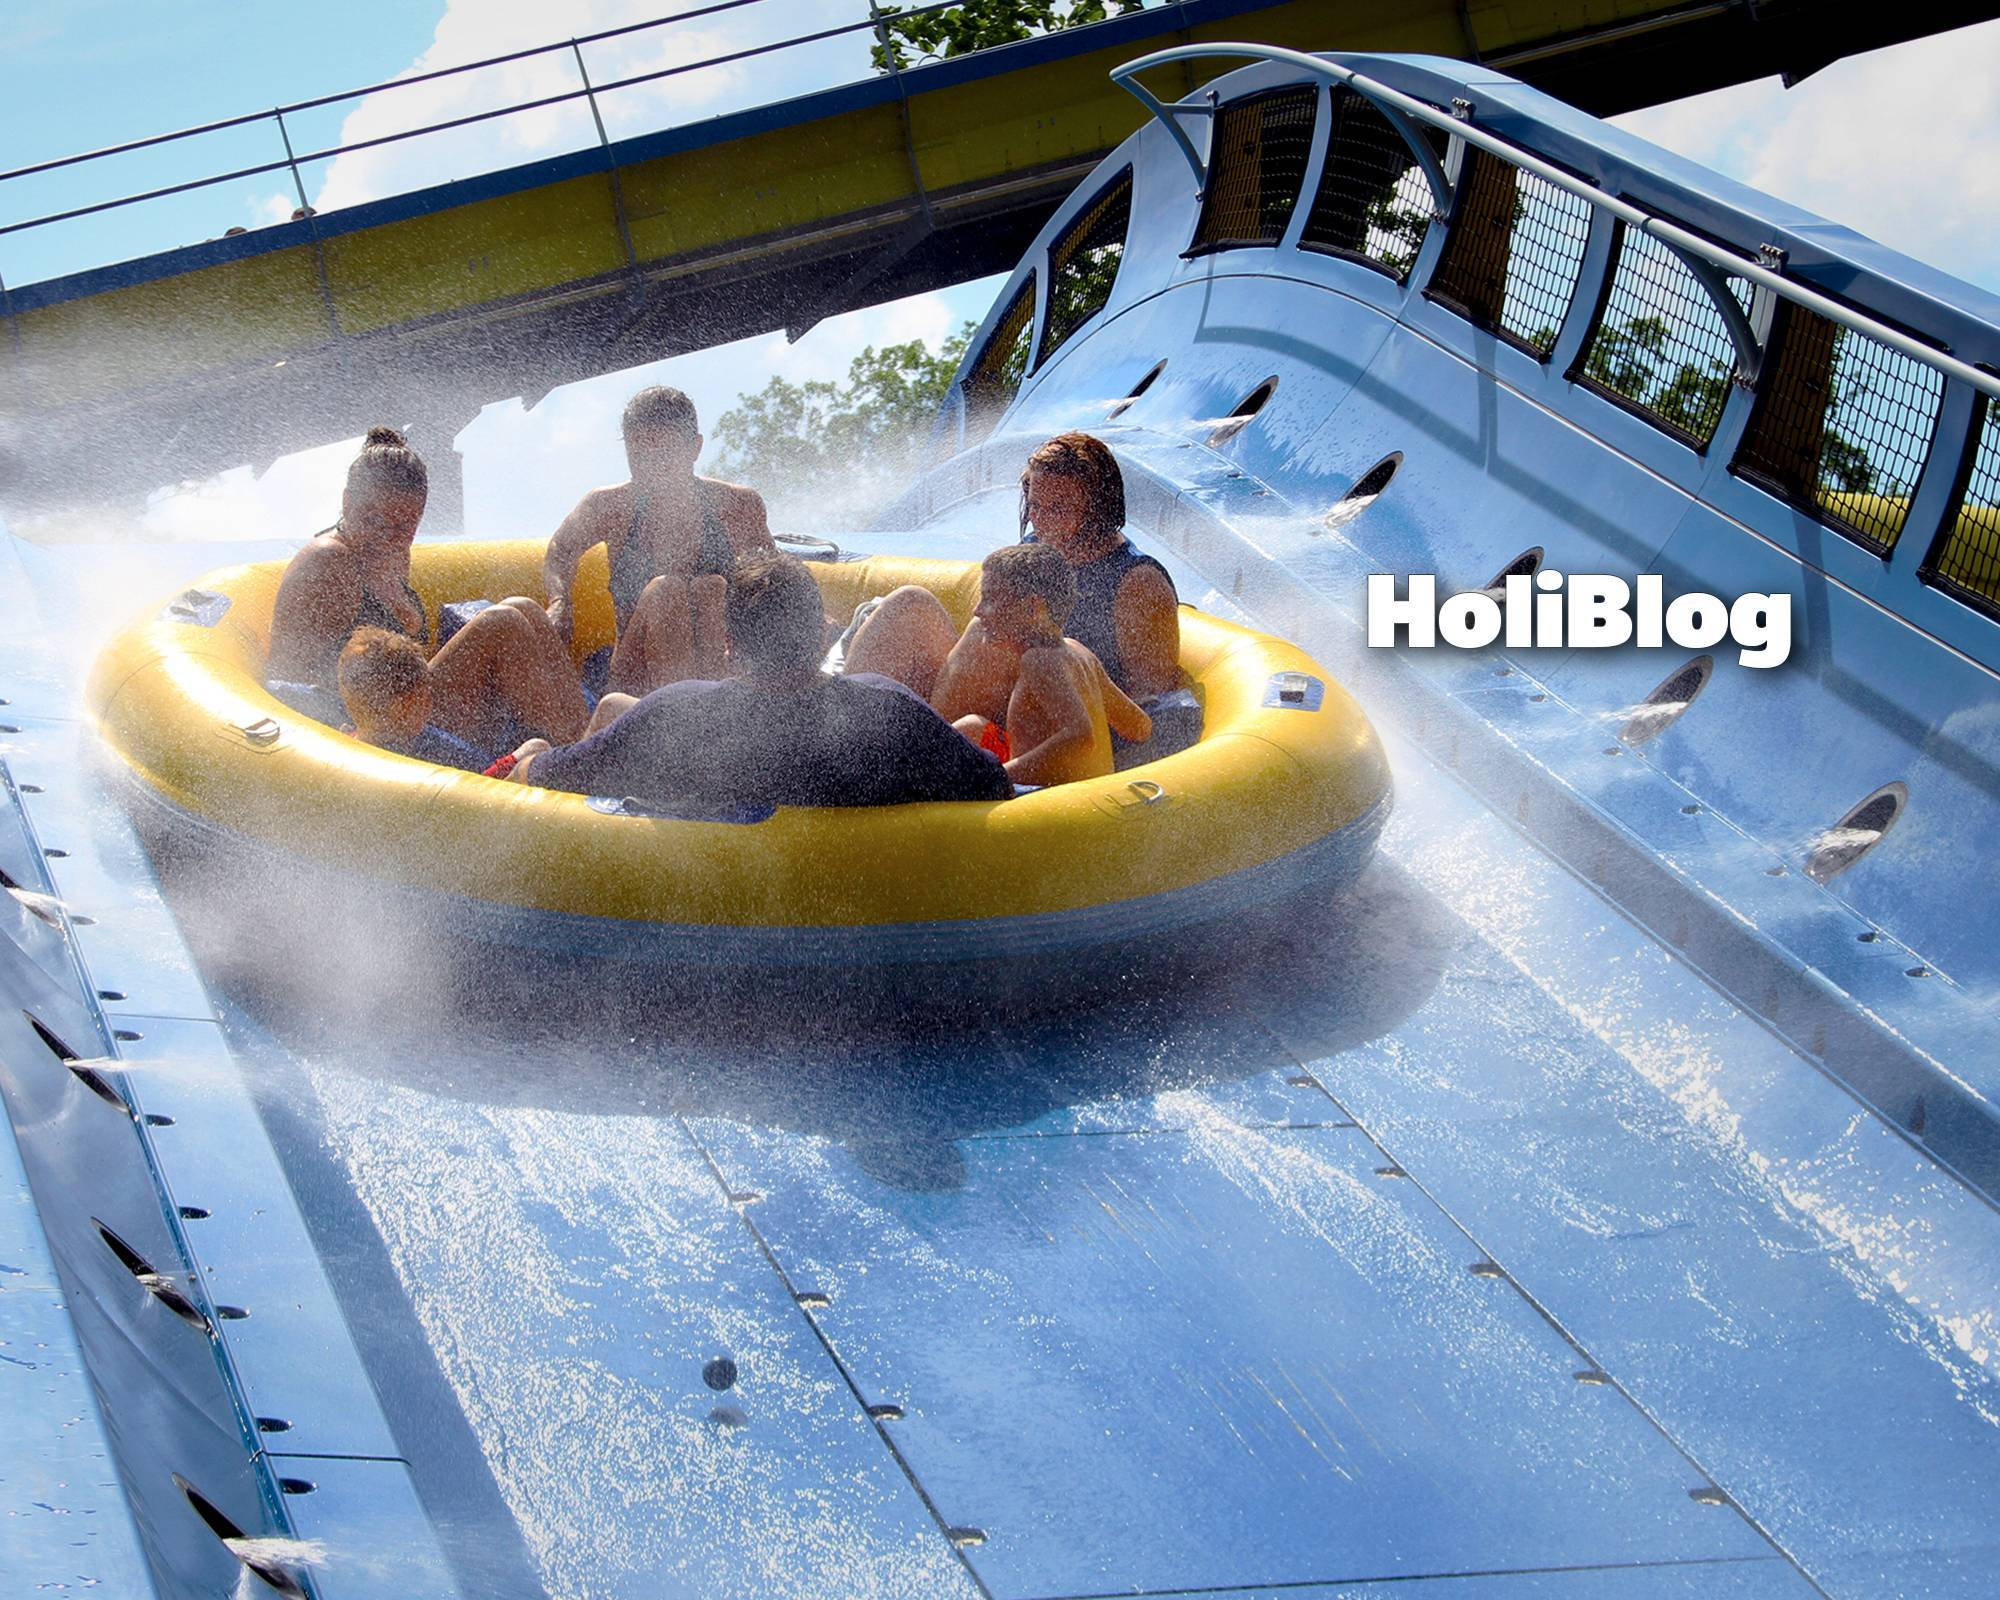 Holiblog | Mammoth Water Coaster